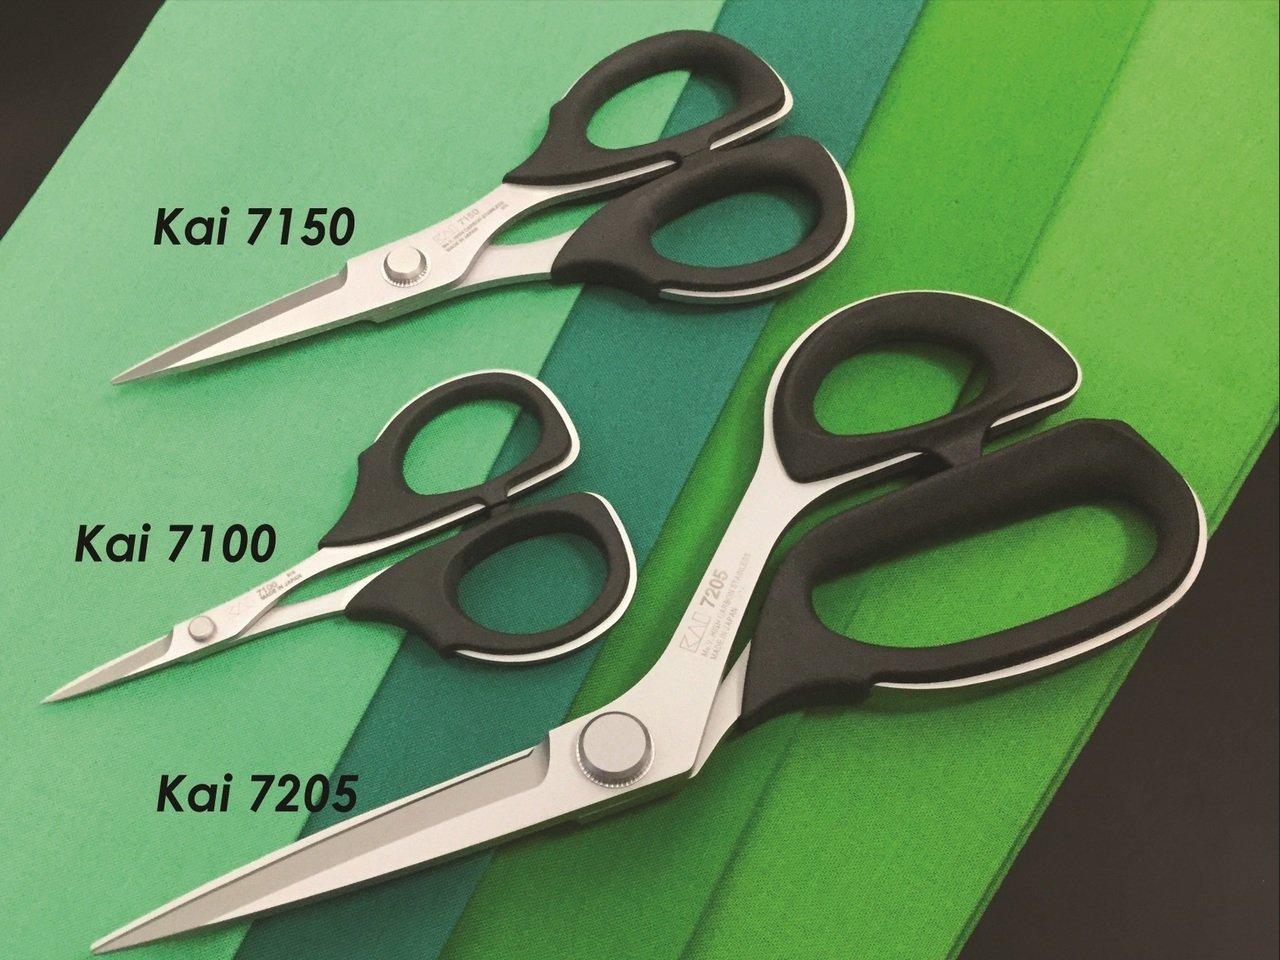 Kai 3 Piece Professional Scissor Set